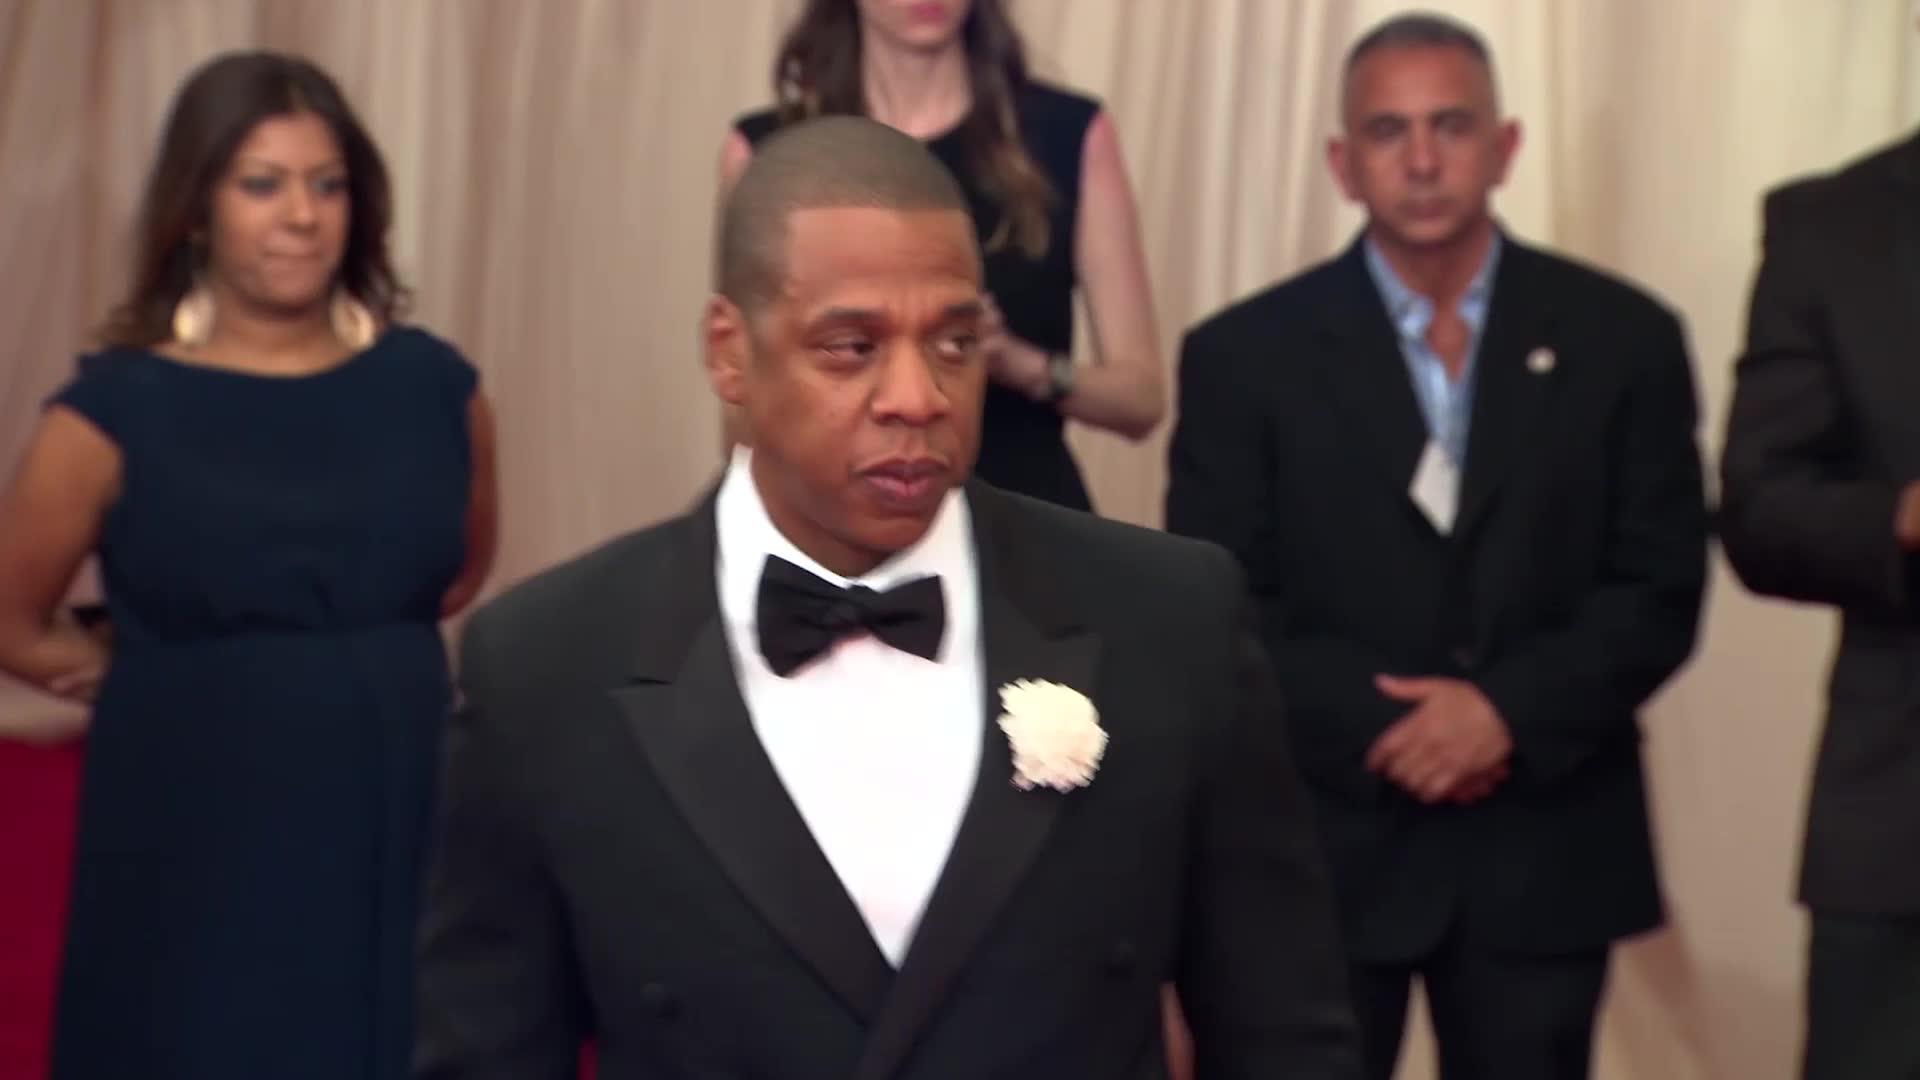 Jay Z Gave Beyoncé 10,000 Roses Before Her Super Bowl 50 Halftime Show